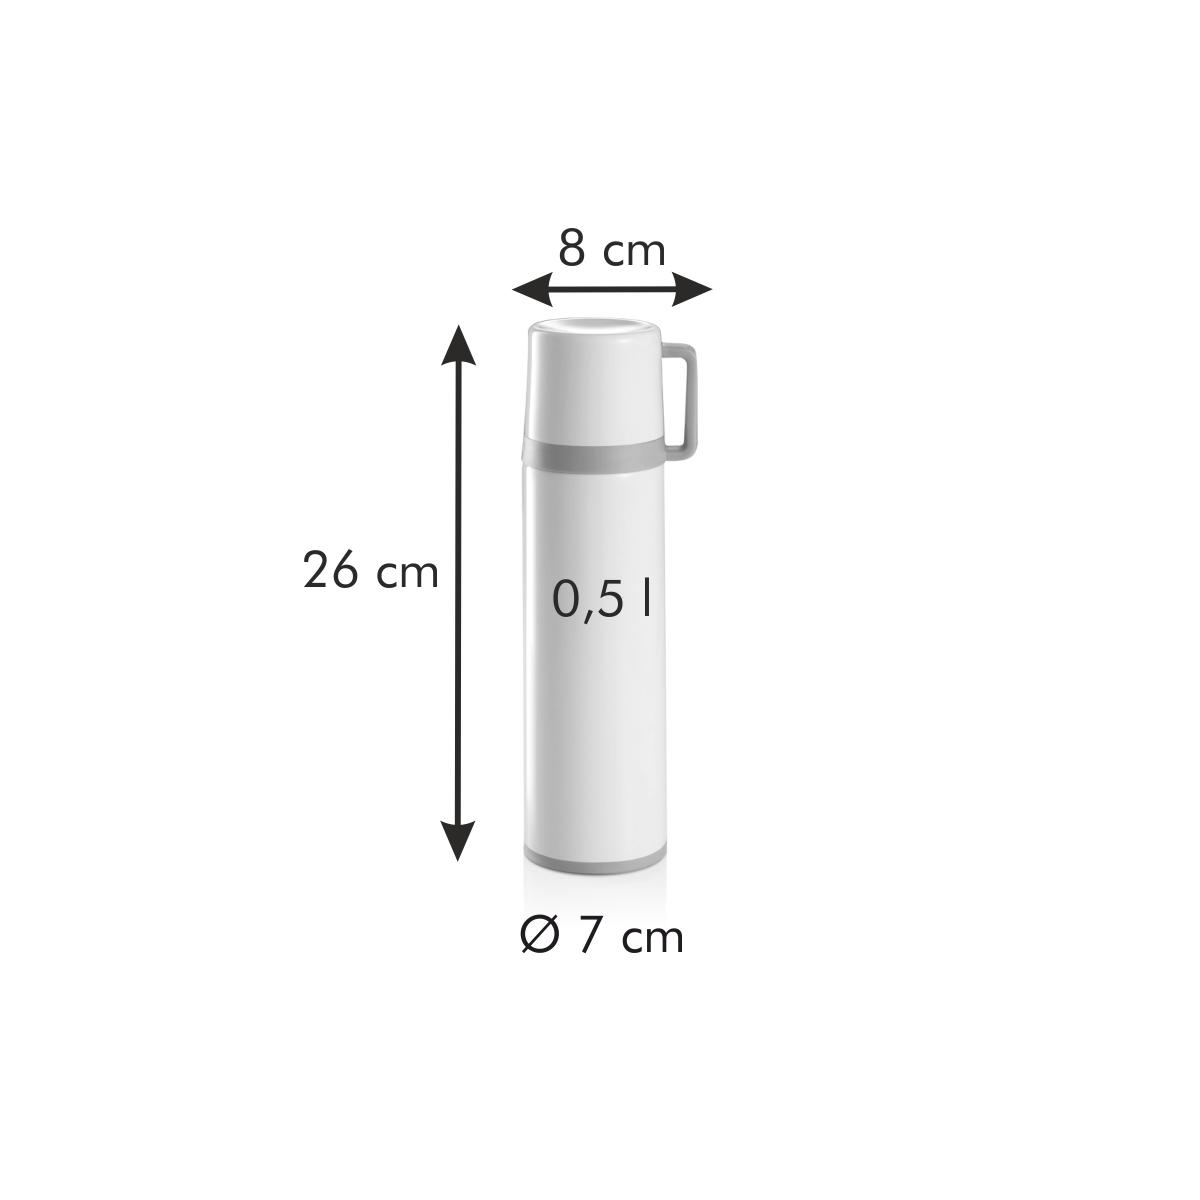 Termoska s hrníčkem CONSTANT CREAM 0,5 l, nerez